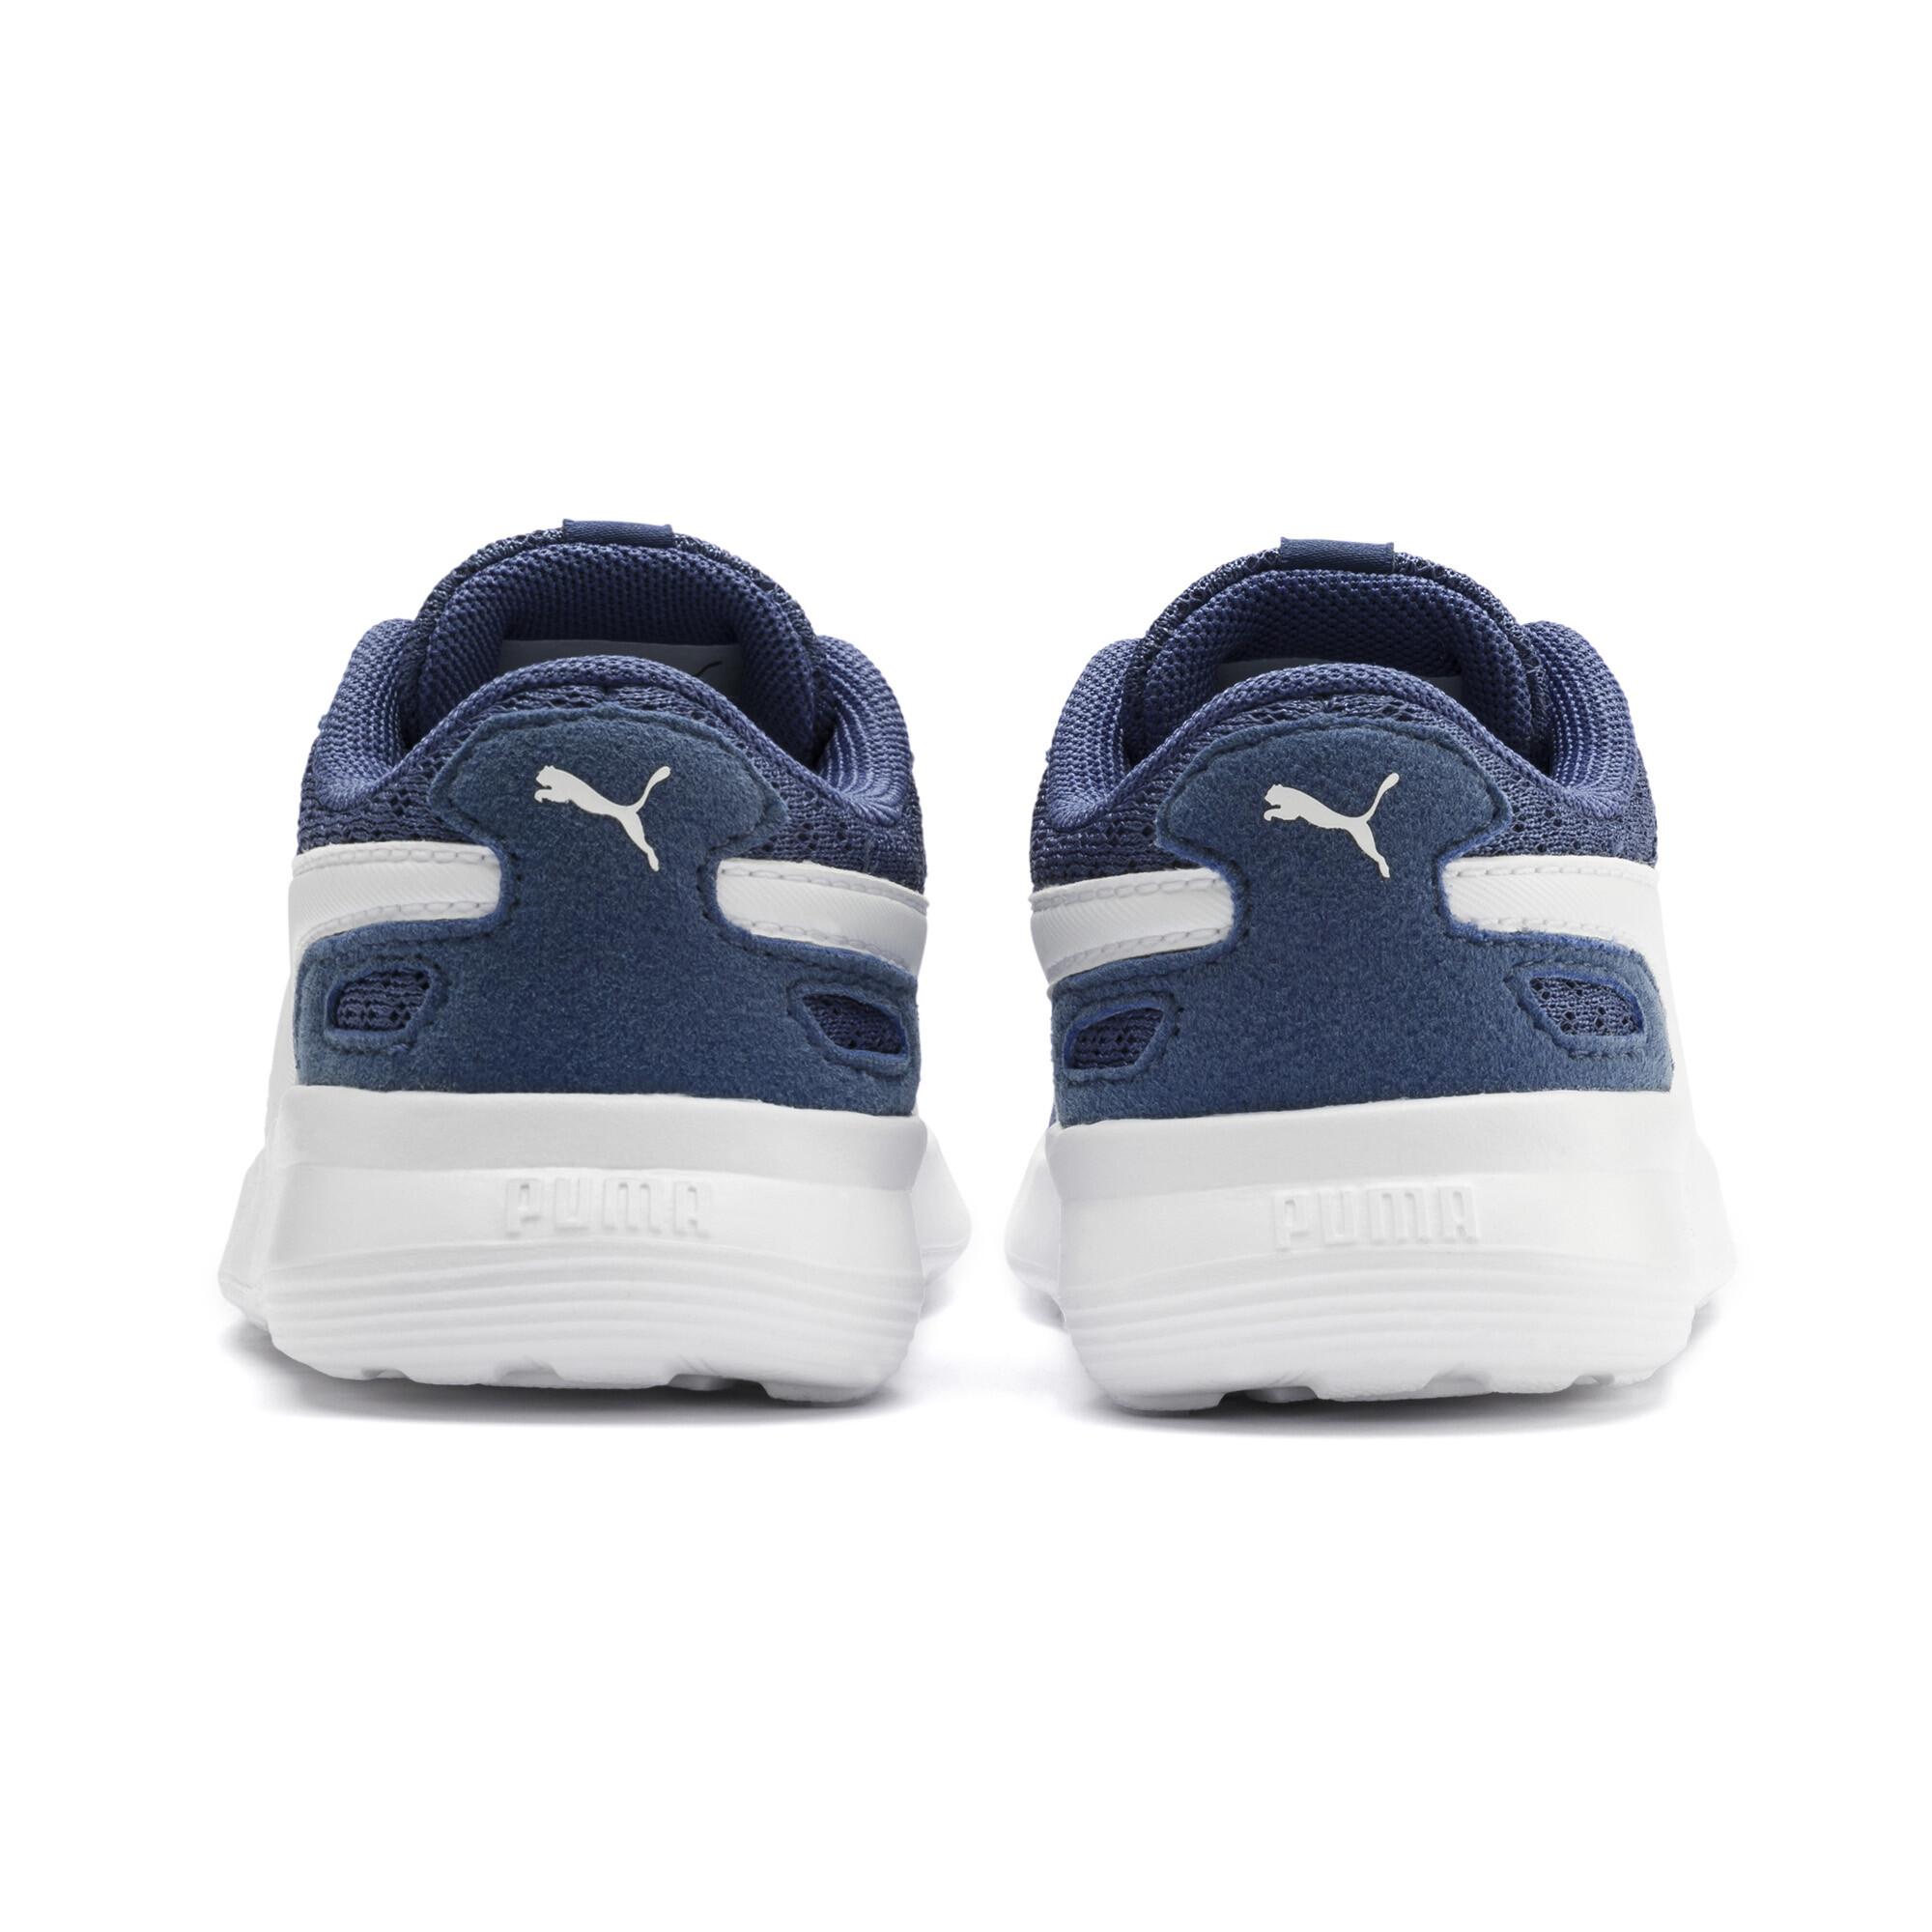 PUMA-ST-Activate-AC-Toddler-Shoes-Kids-Shoe-Kids thumbnail 18